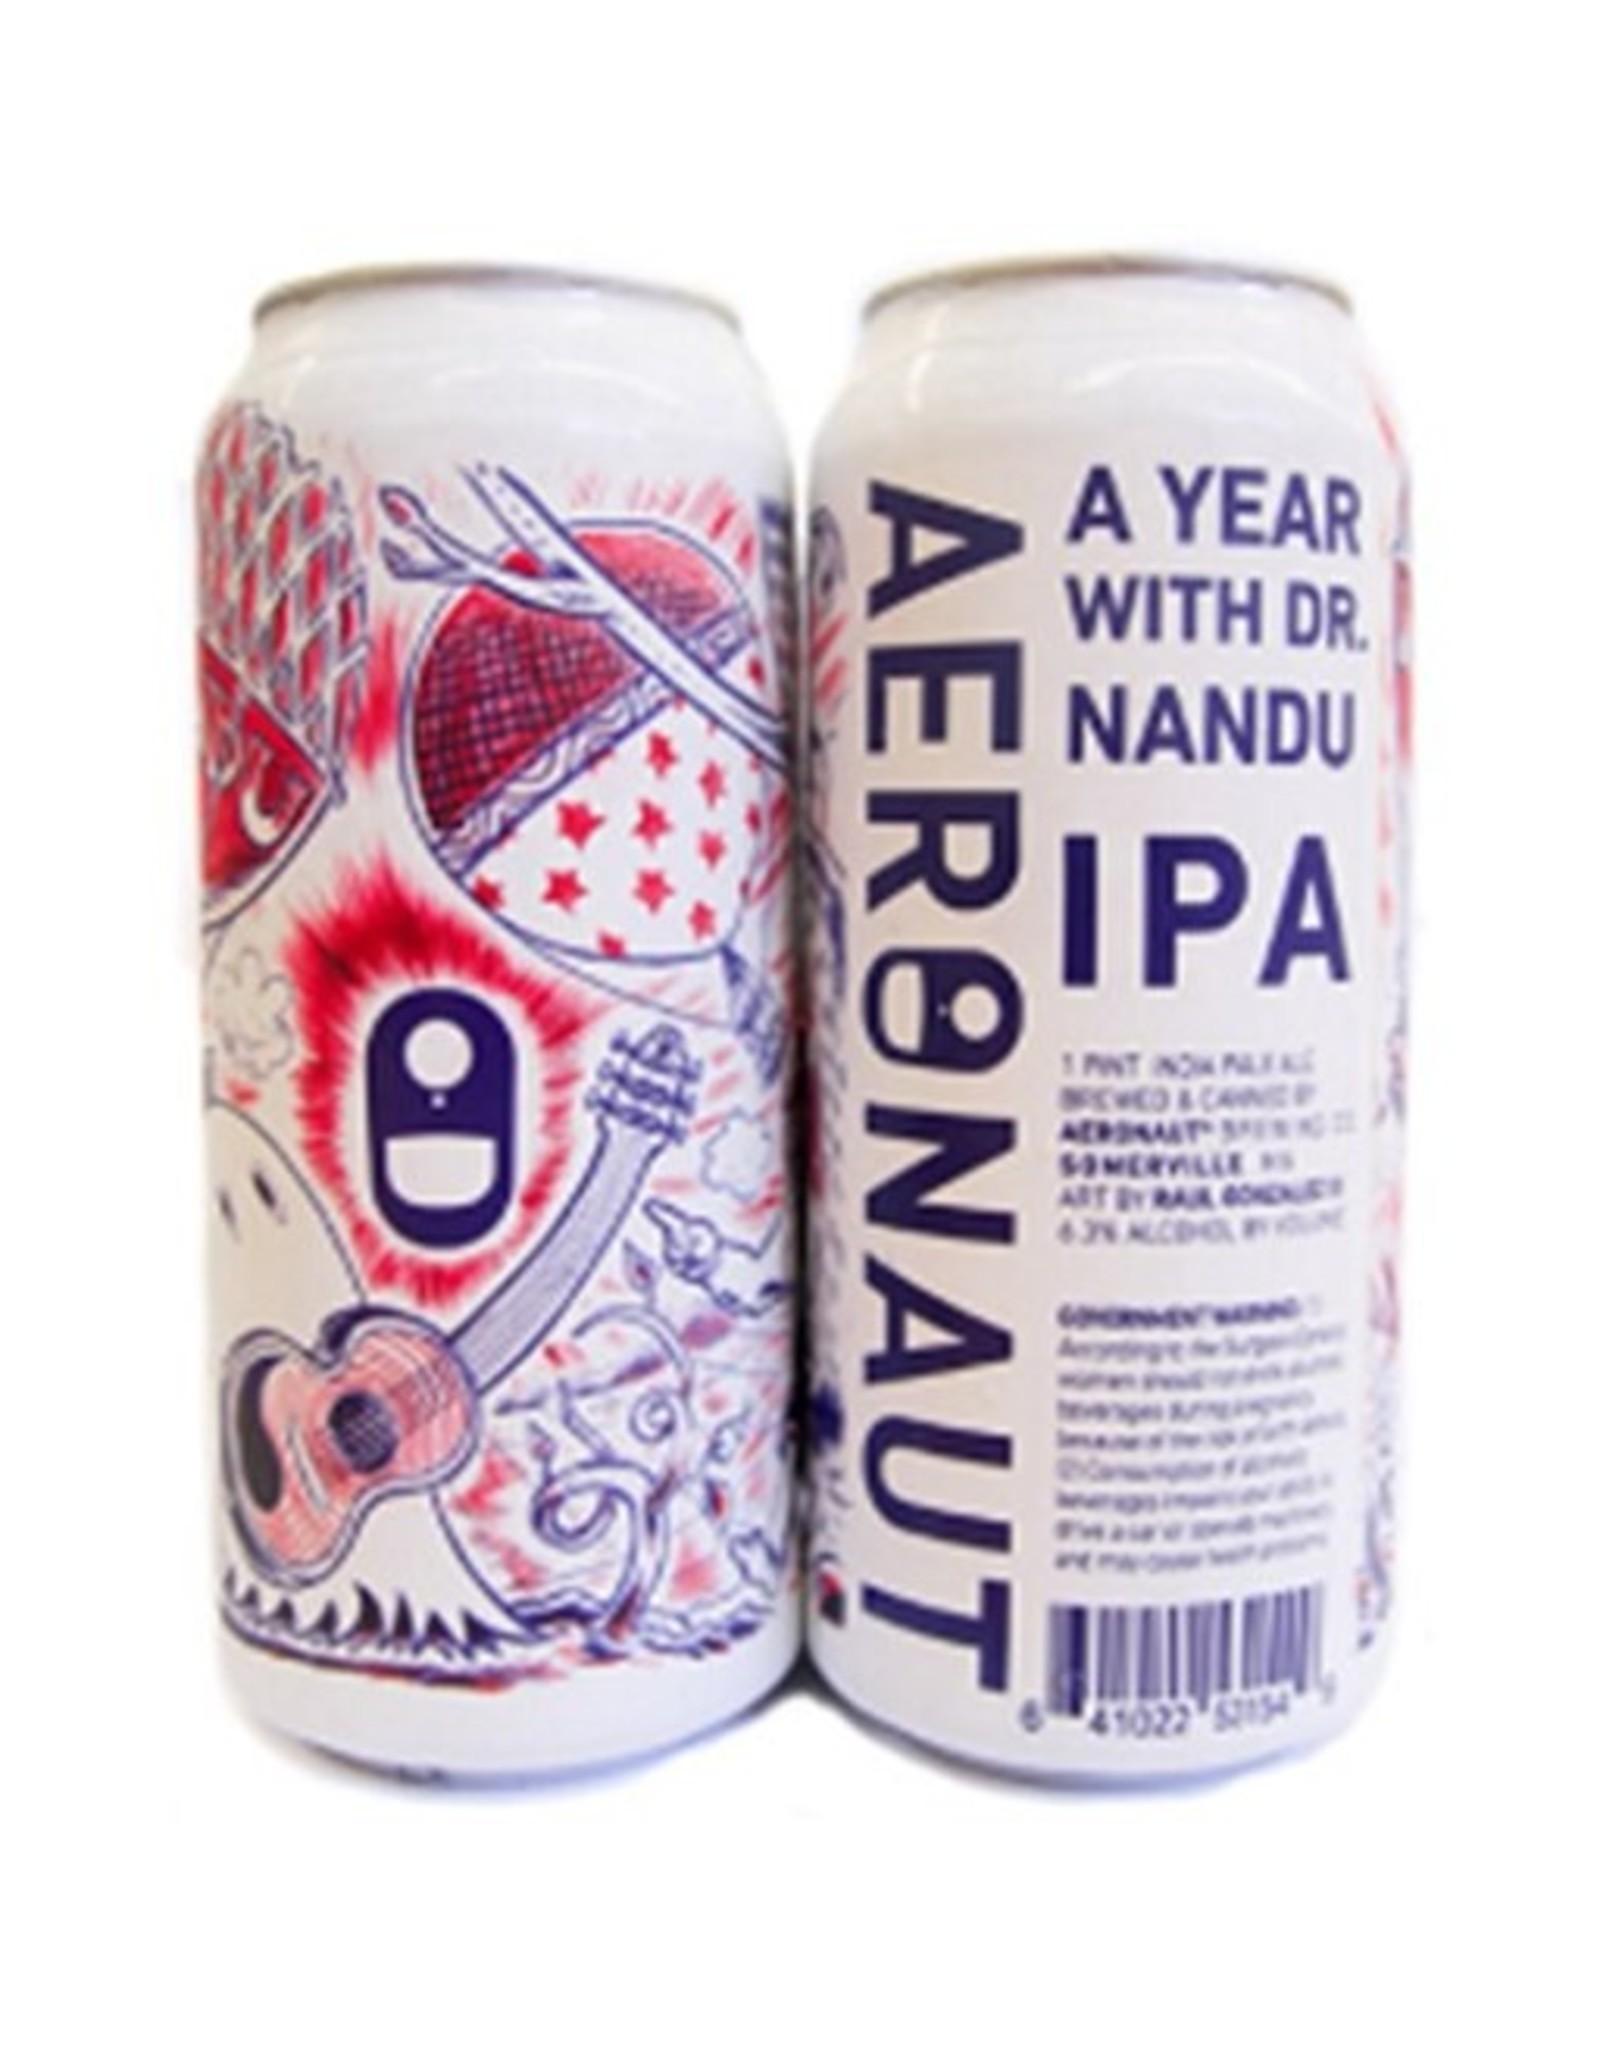 Aeronaut Brewing Co A Year with D. Nandu 4-Pack